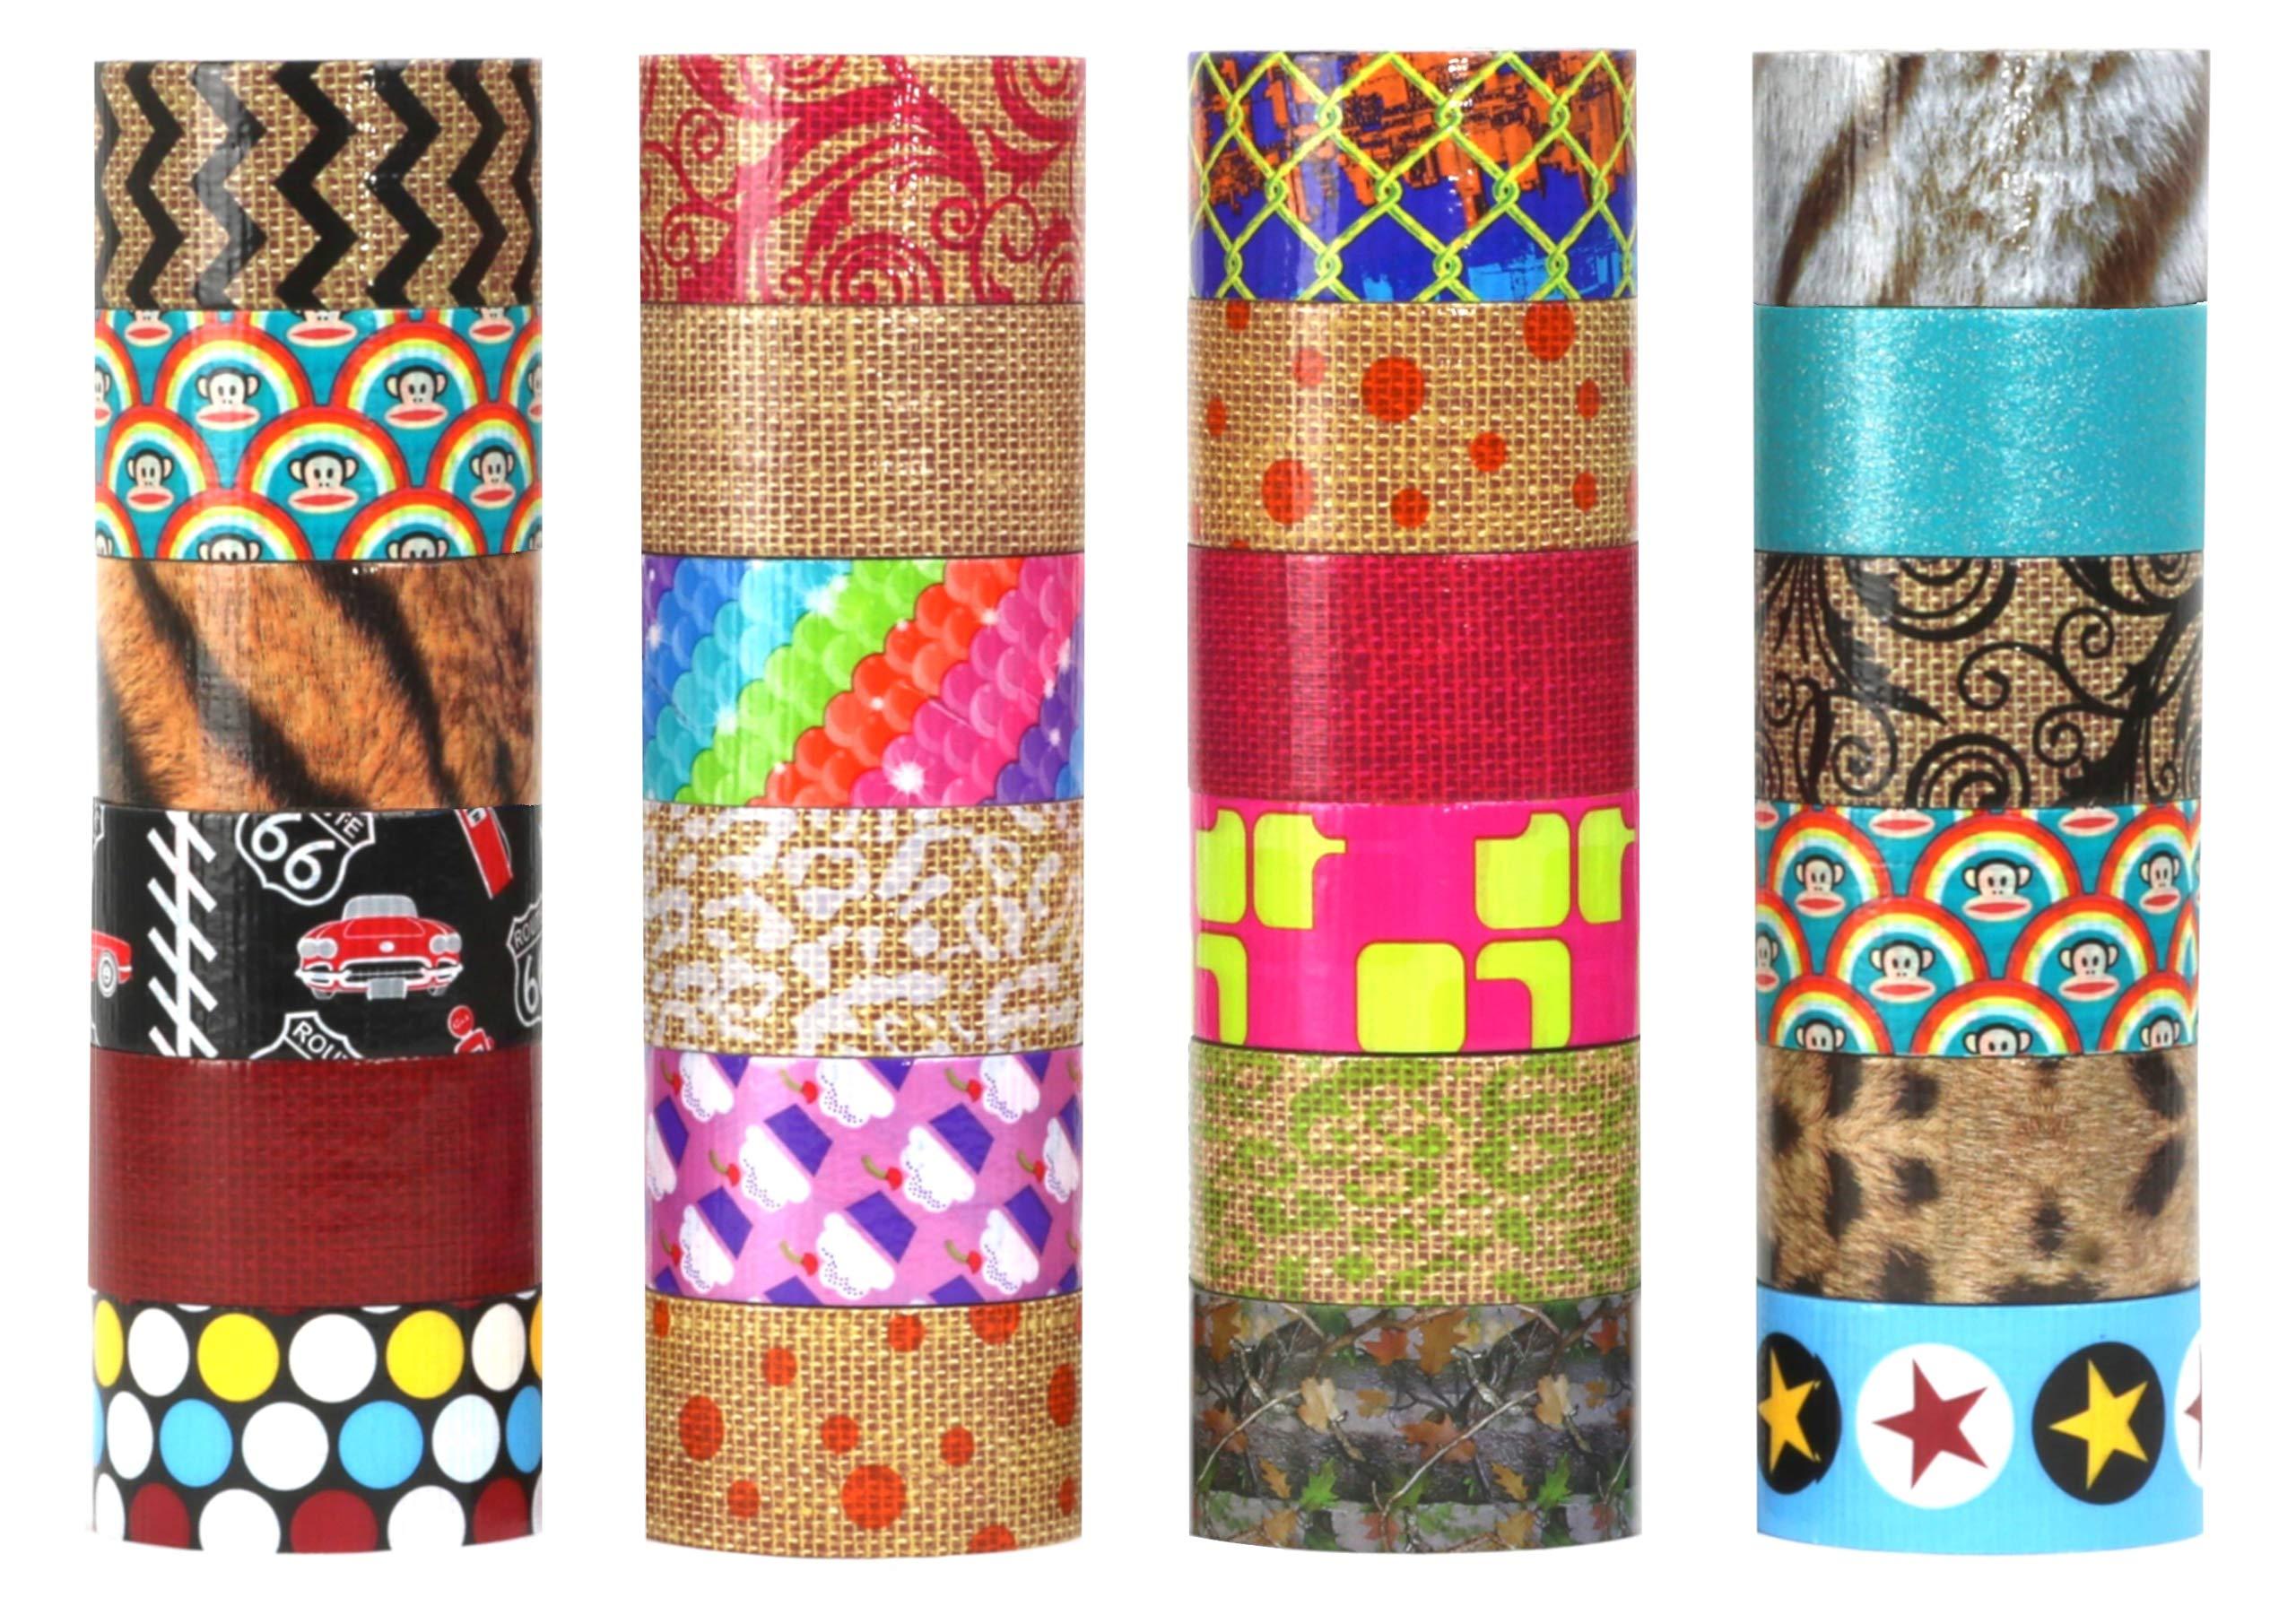 24 Random Rolls Assorted Duct Tape Bulk Set Of Colored Duct Tape